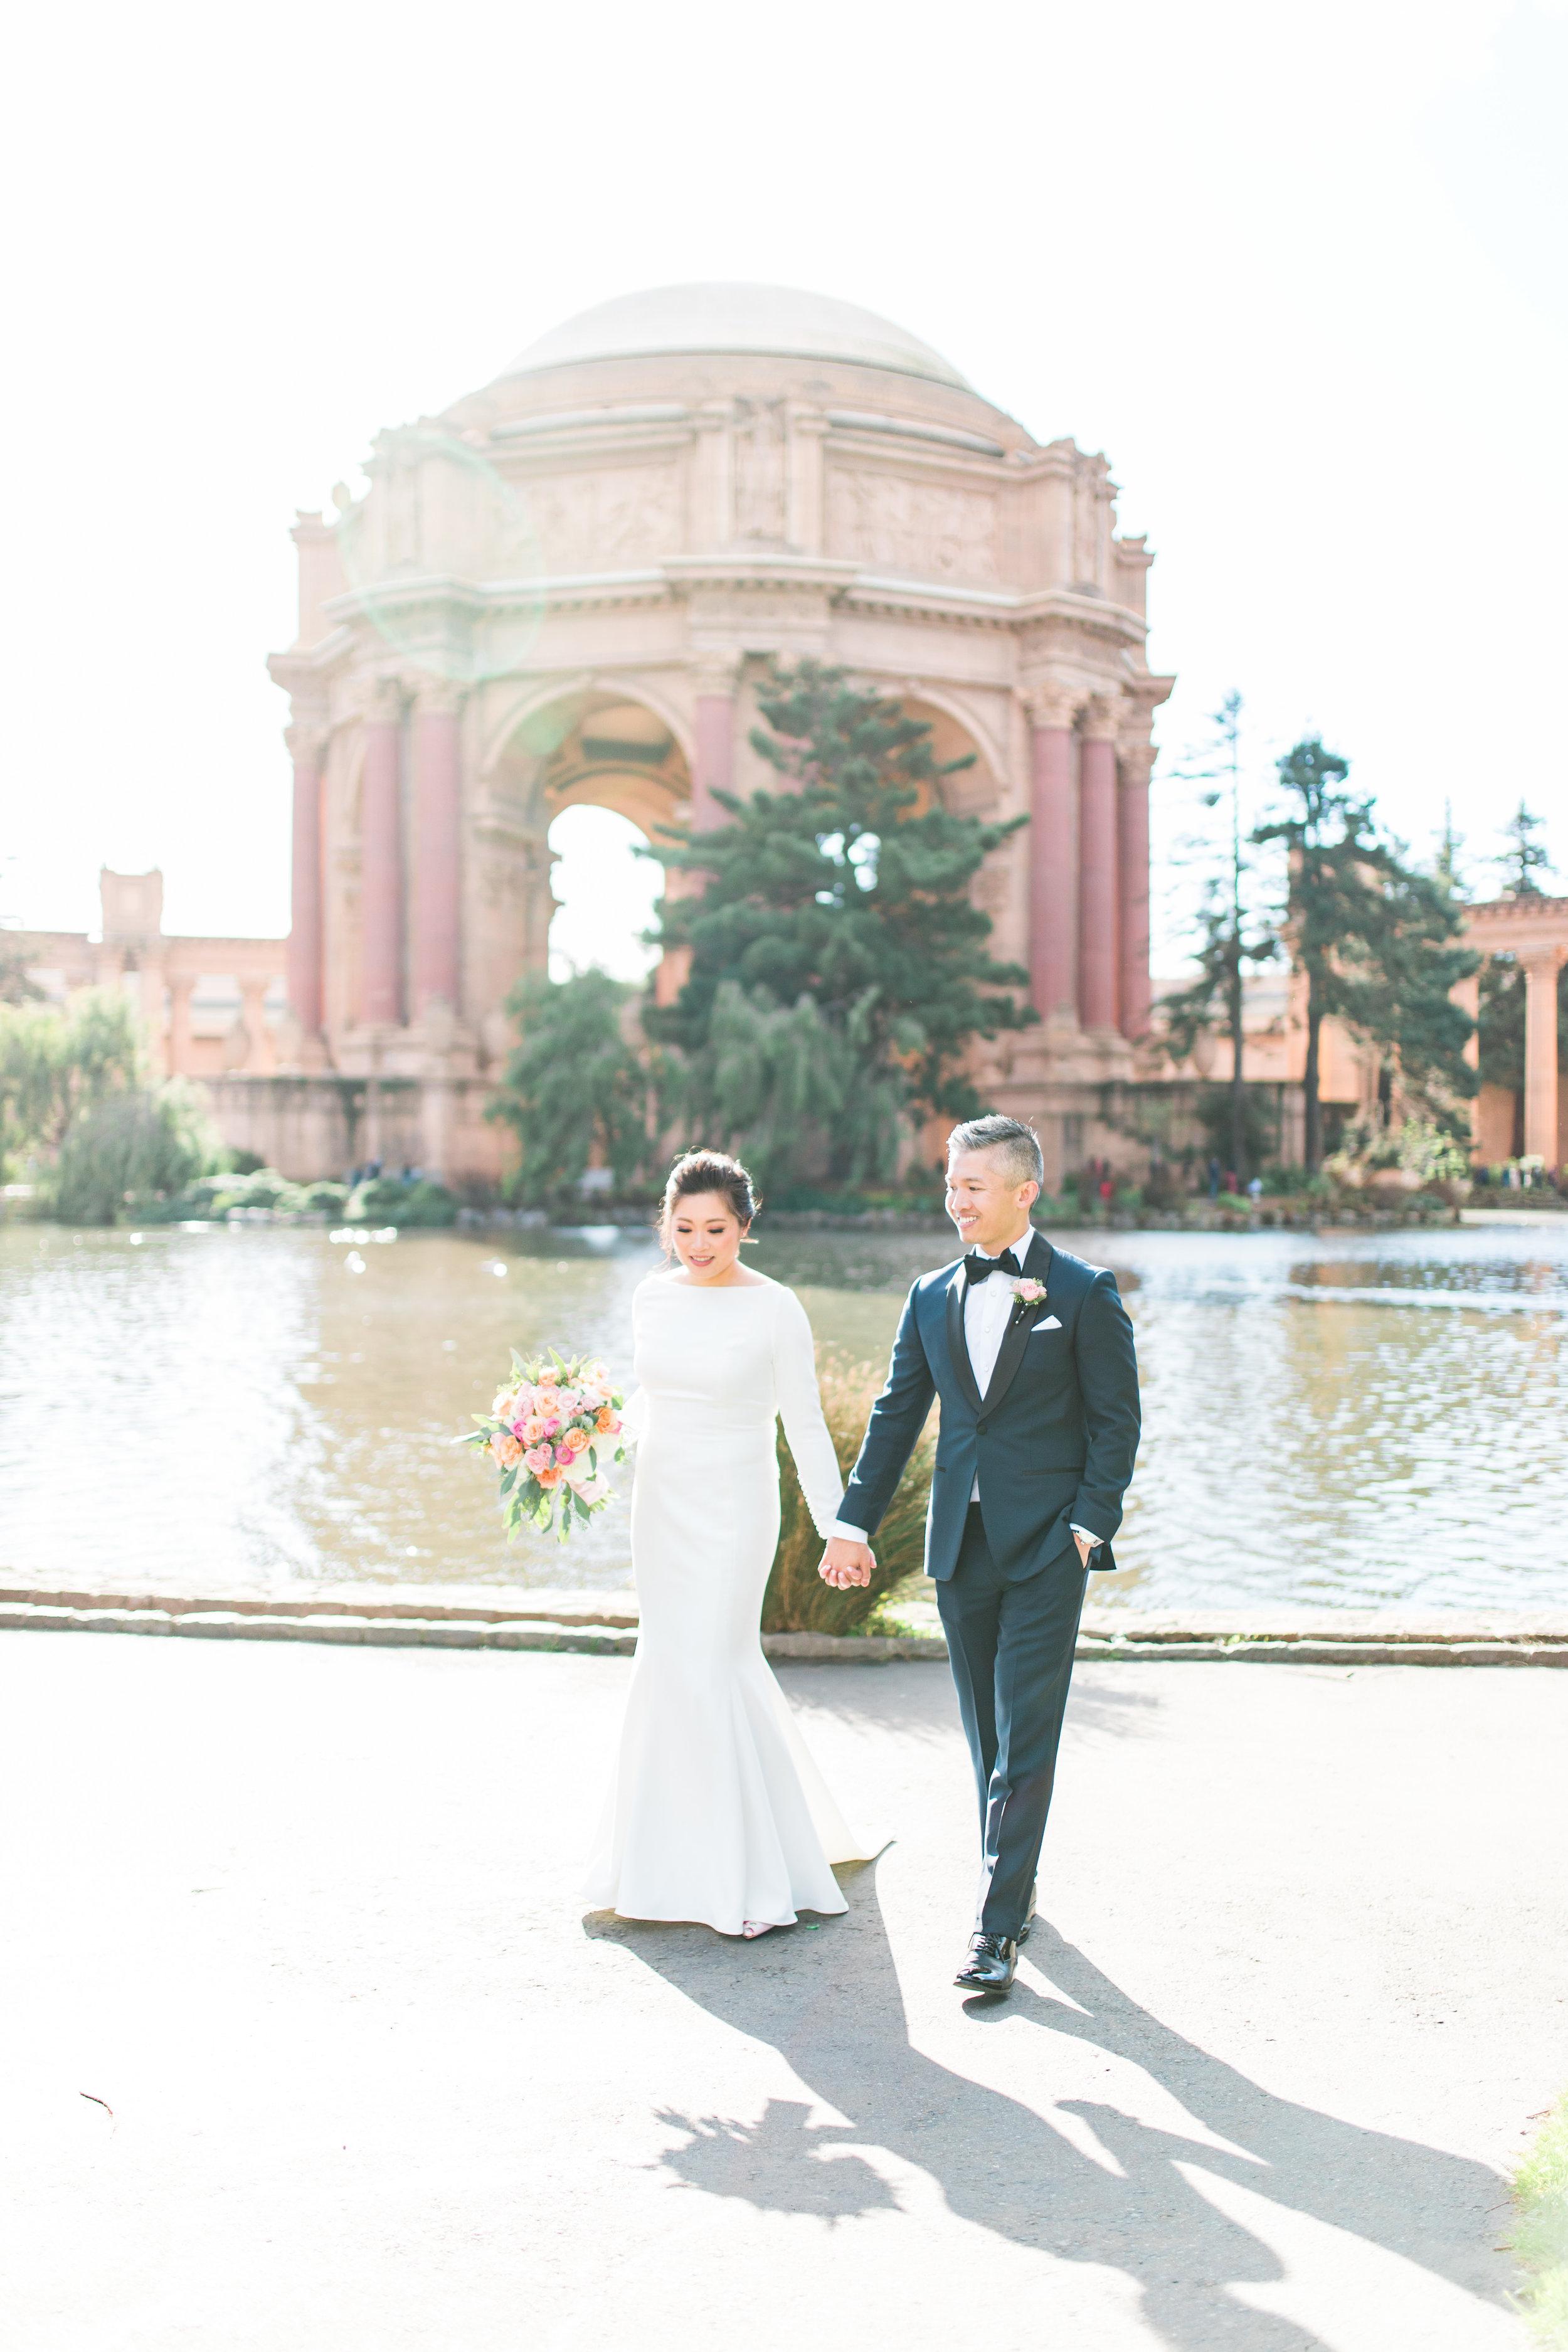 Marina-Eugene-Wedding-by-JBJ-Pictures-143.jpg